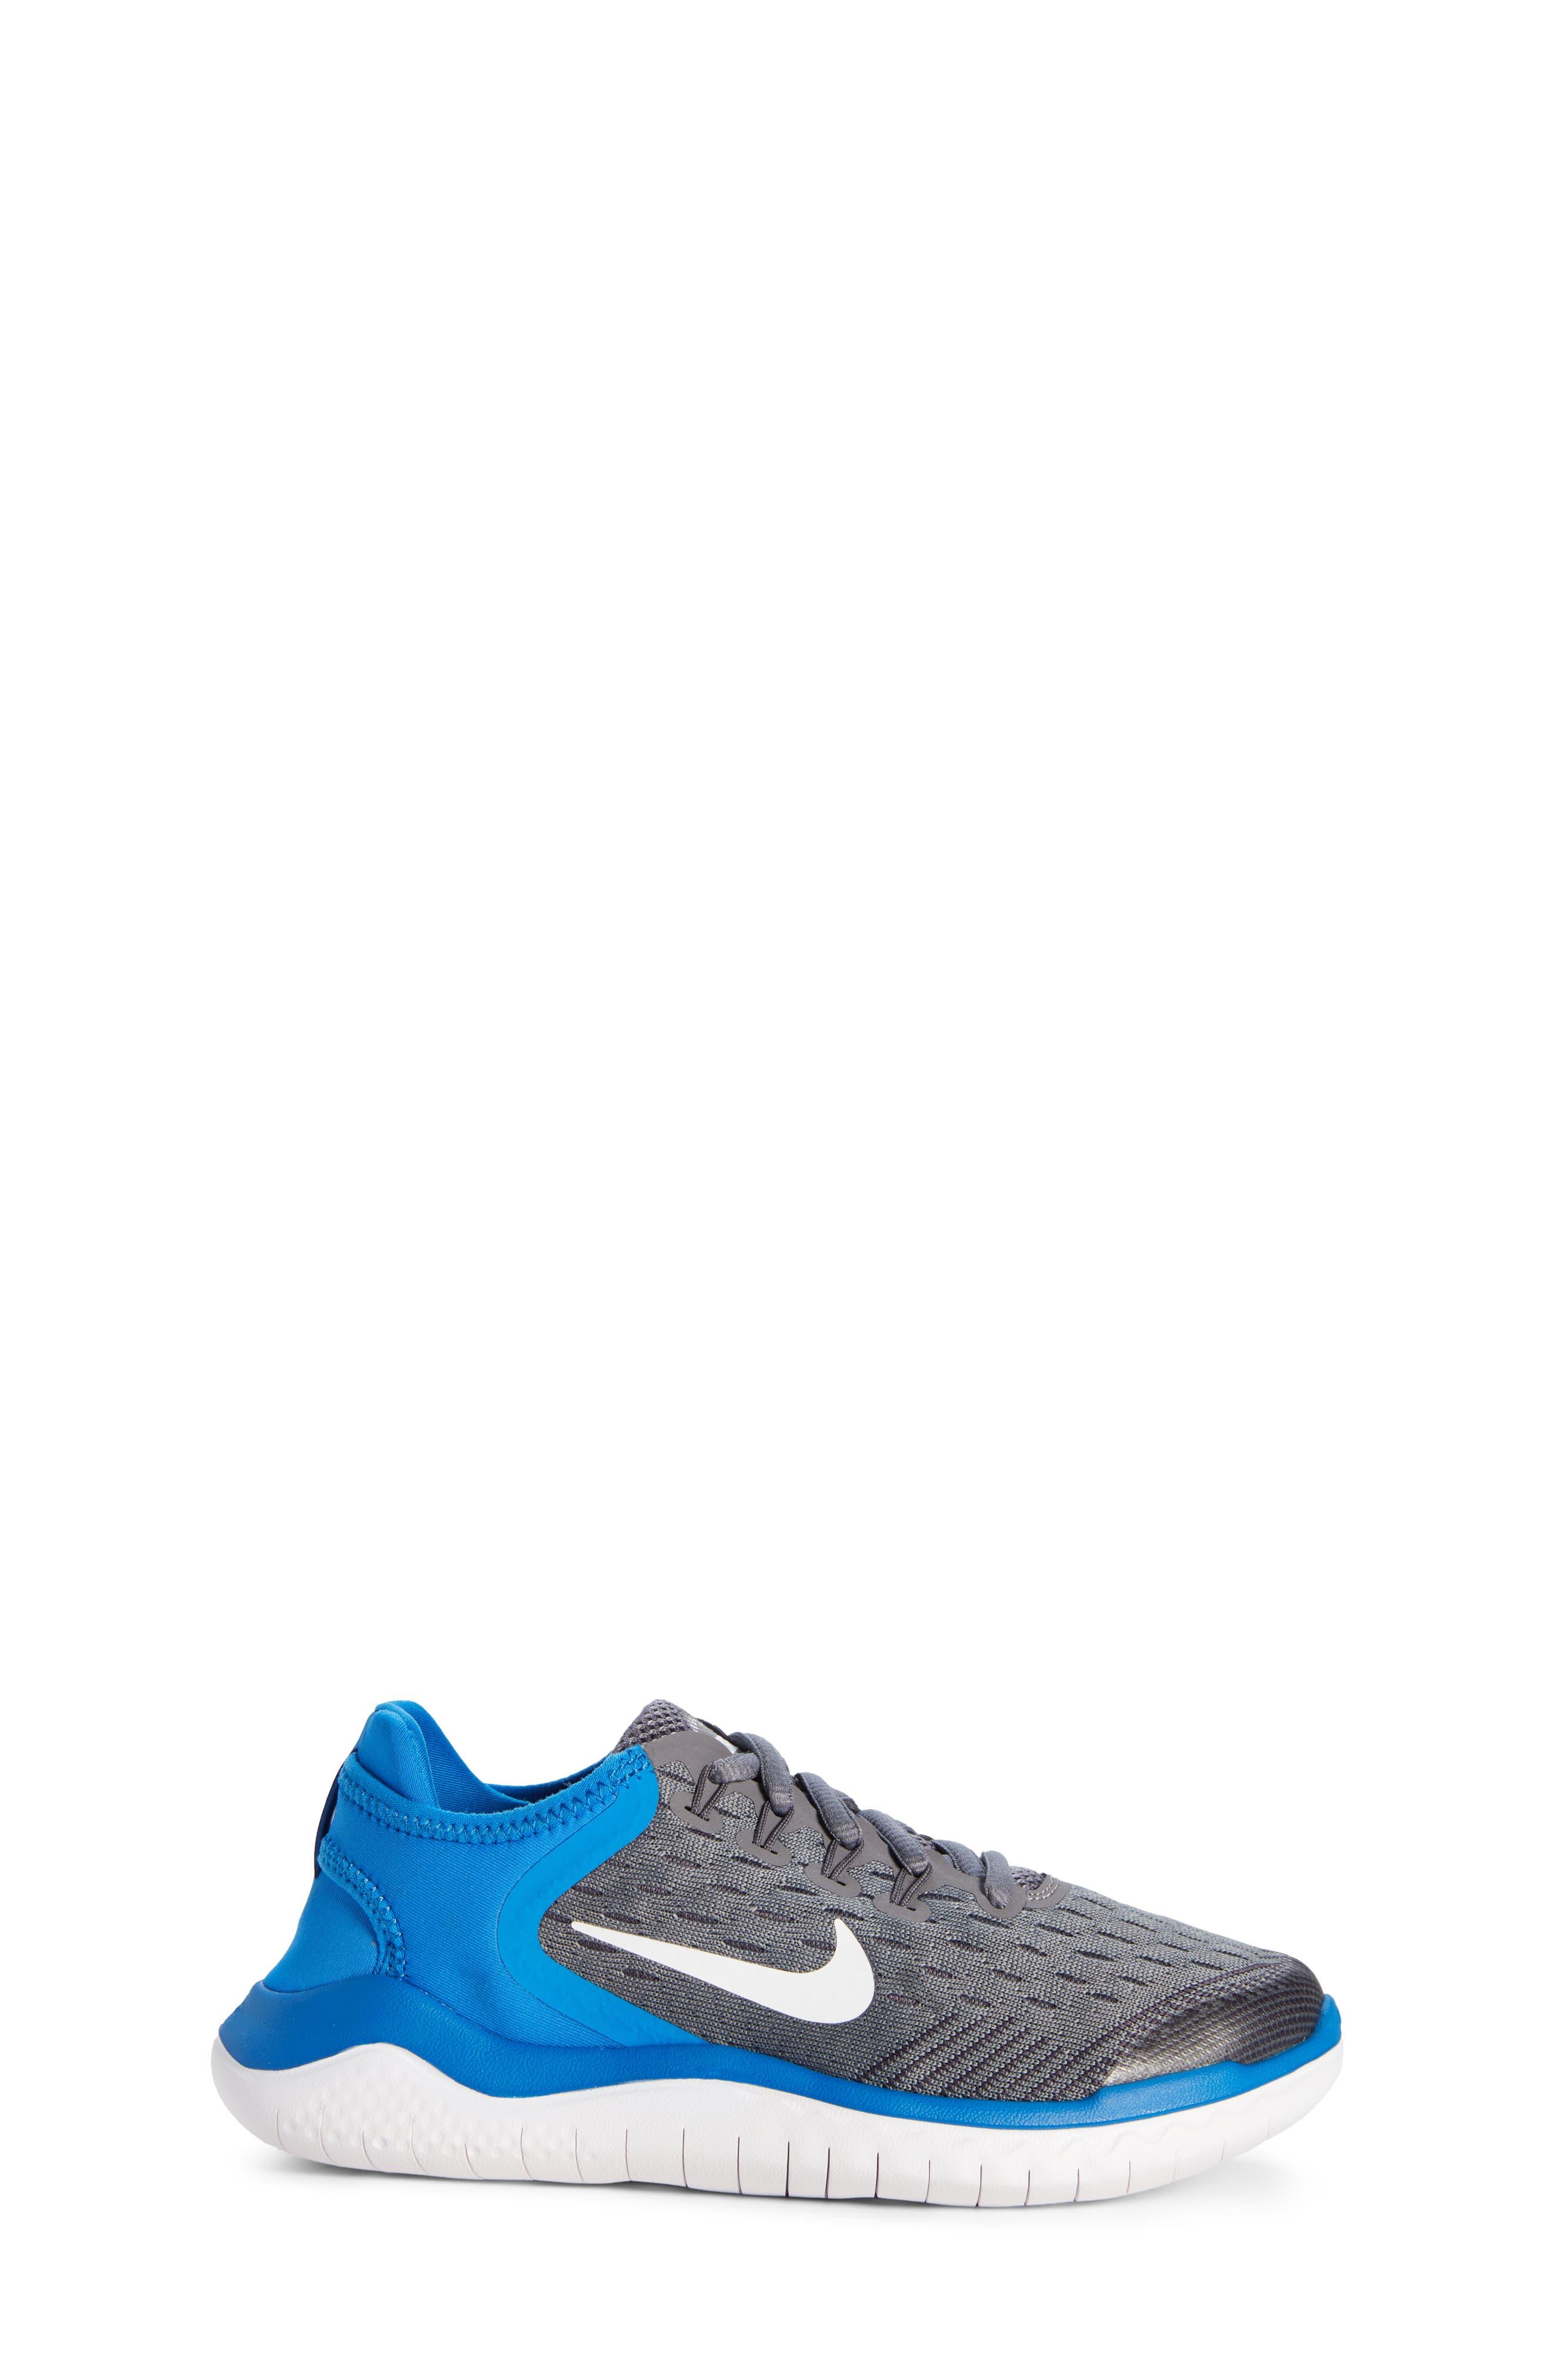 Free RN 2018 Running Shoe,                             Alternate thumbnail 3, color,                             GREY/WHITE/BLUE